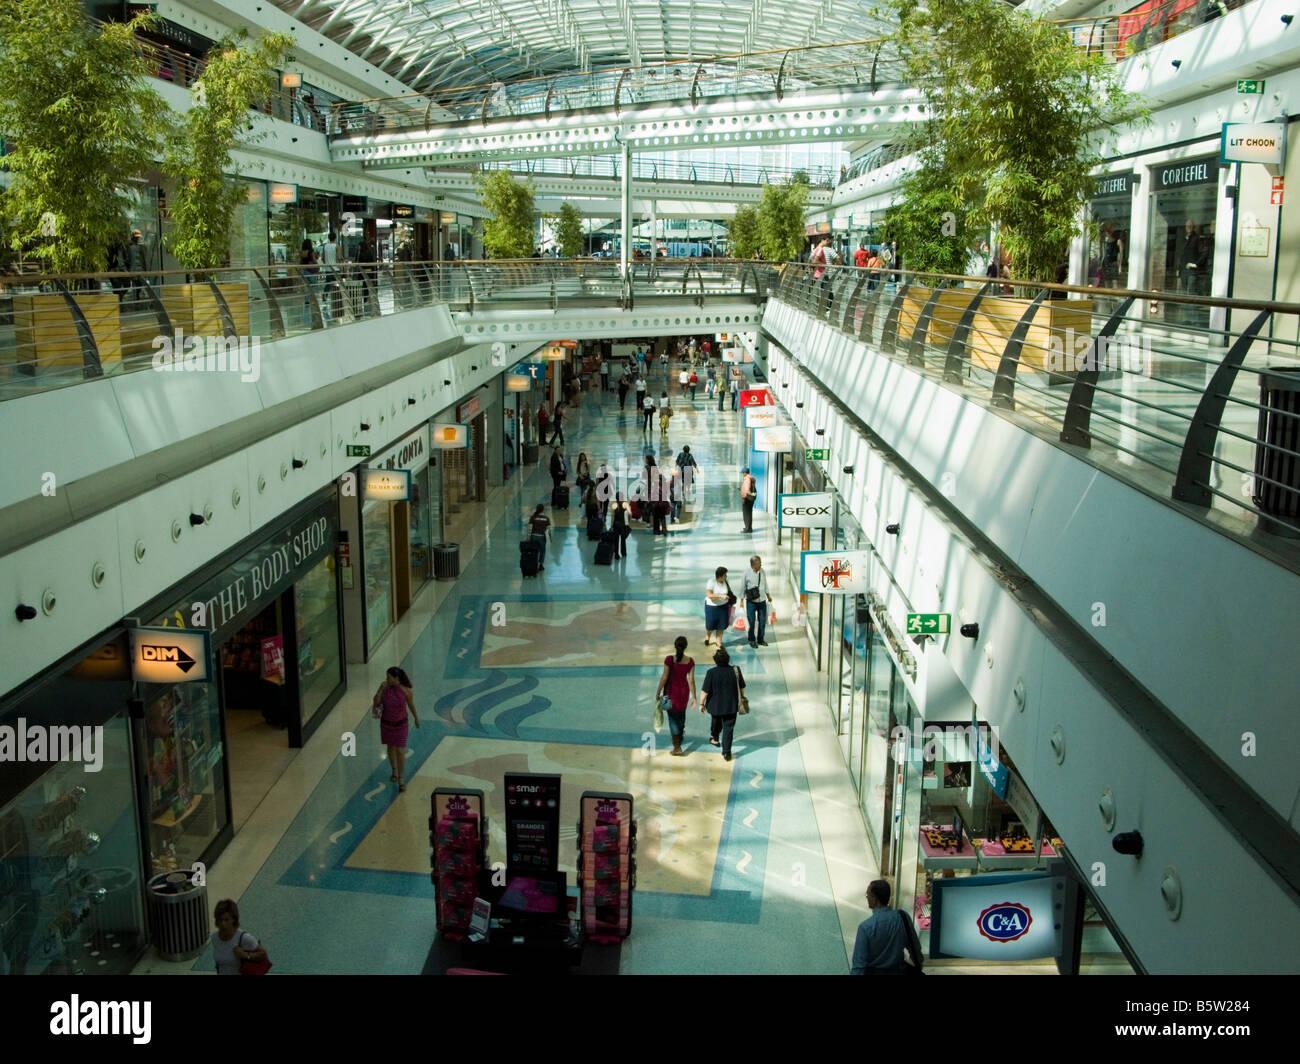 Vasco da Gama shopping mall, Parque das Nacoes, Oriente, Lisbon, Portugal Stock Photo